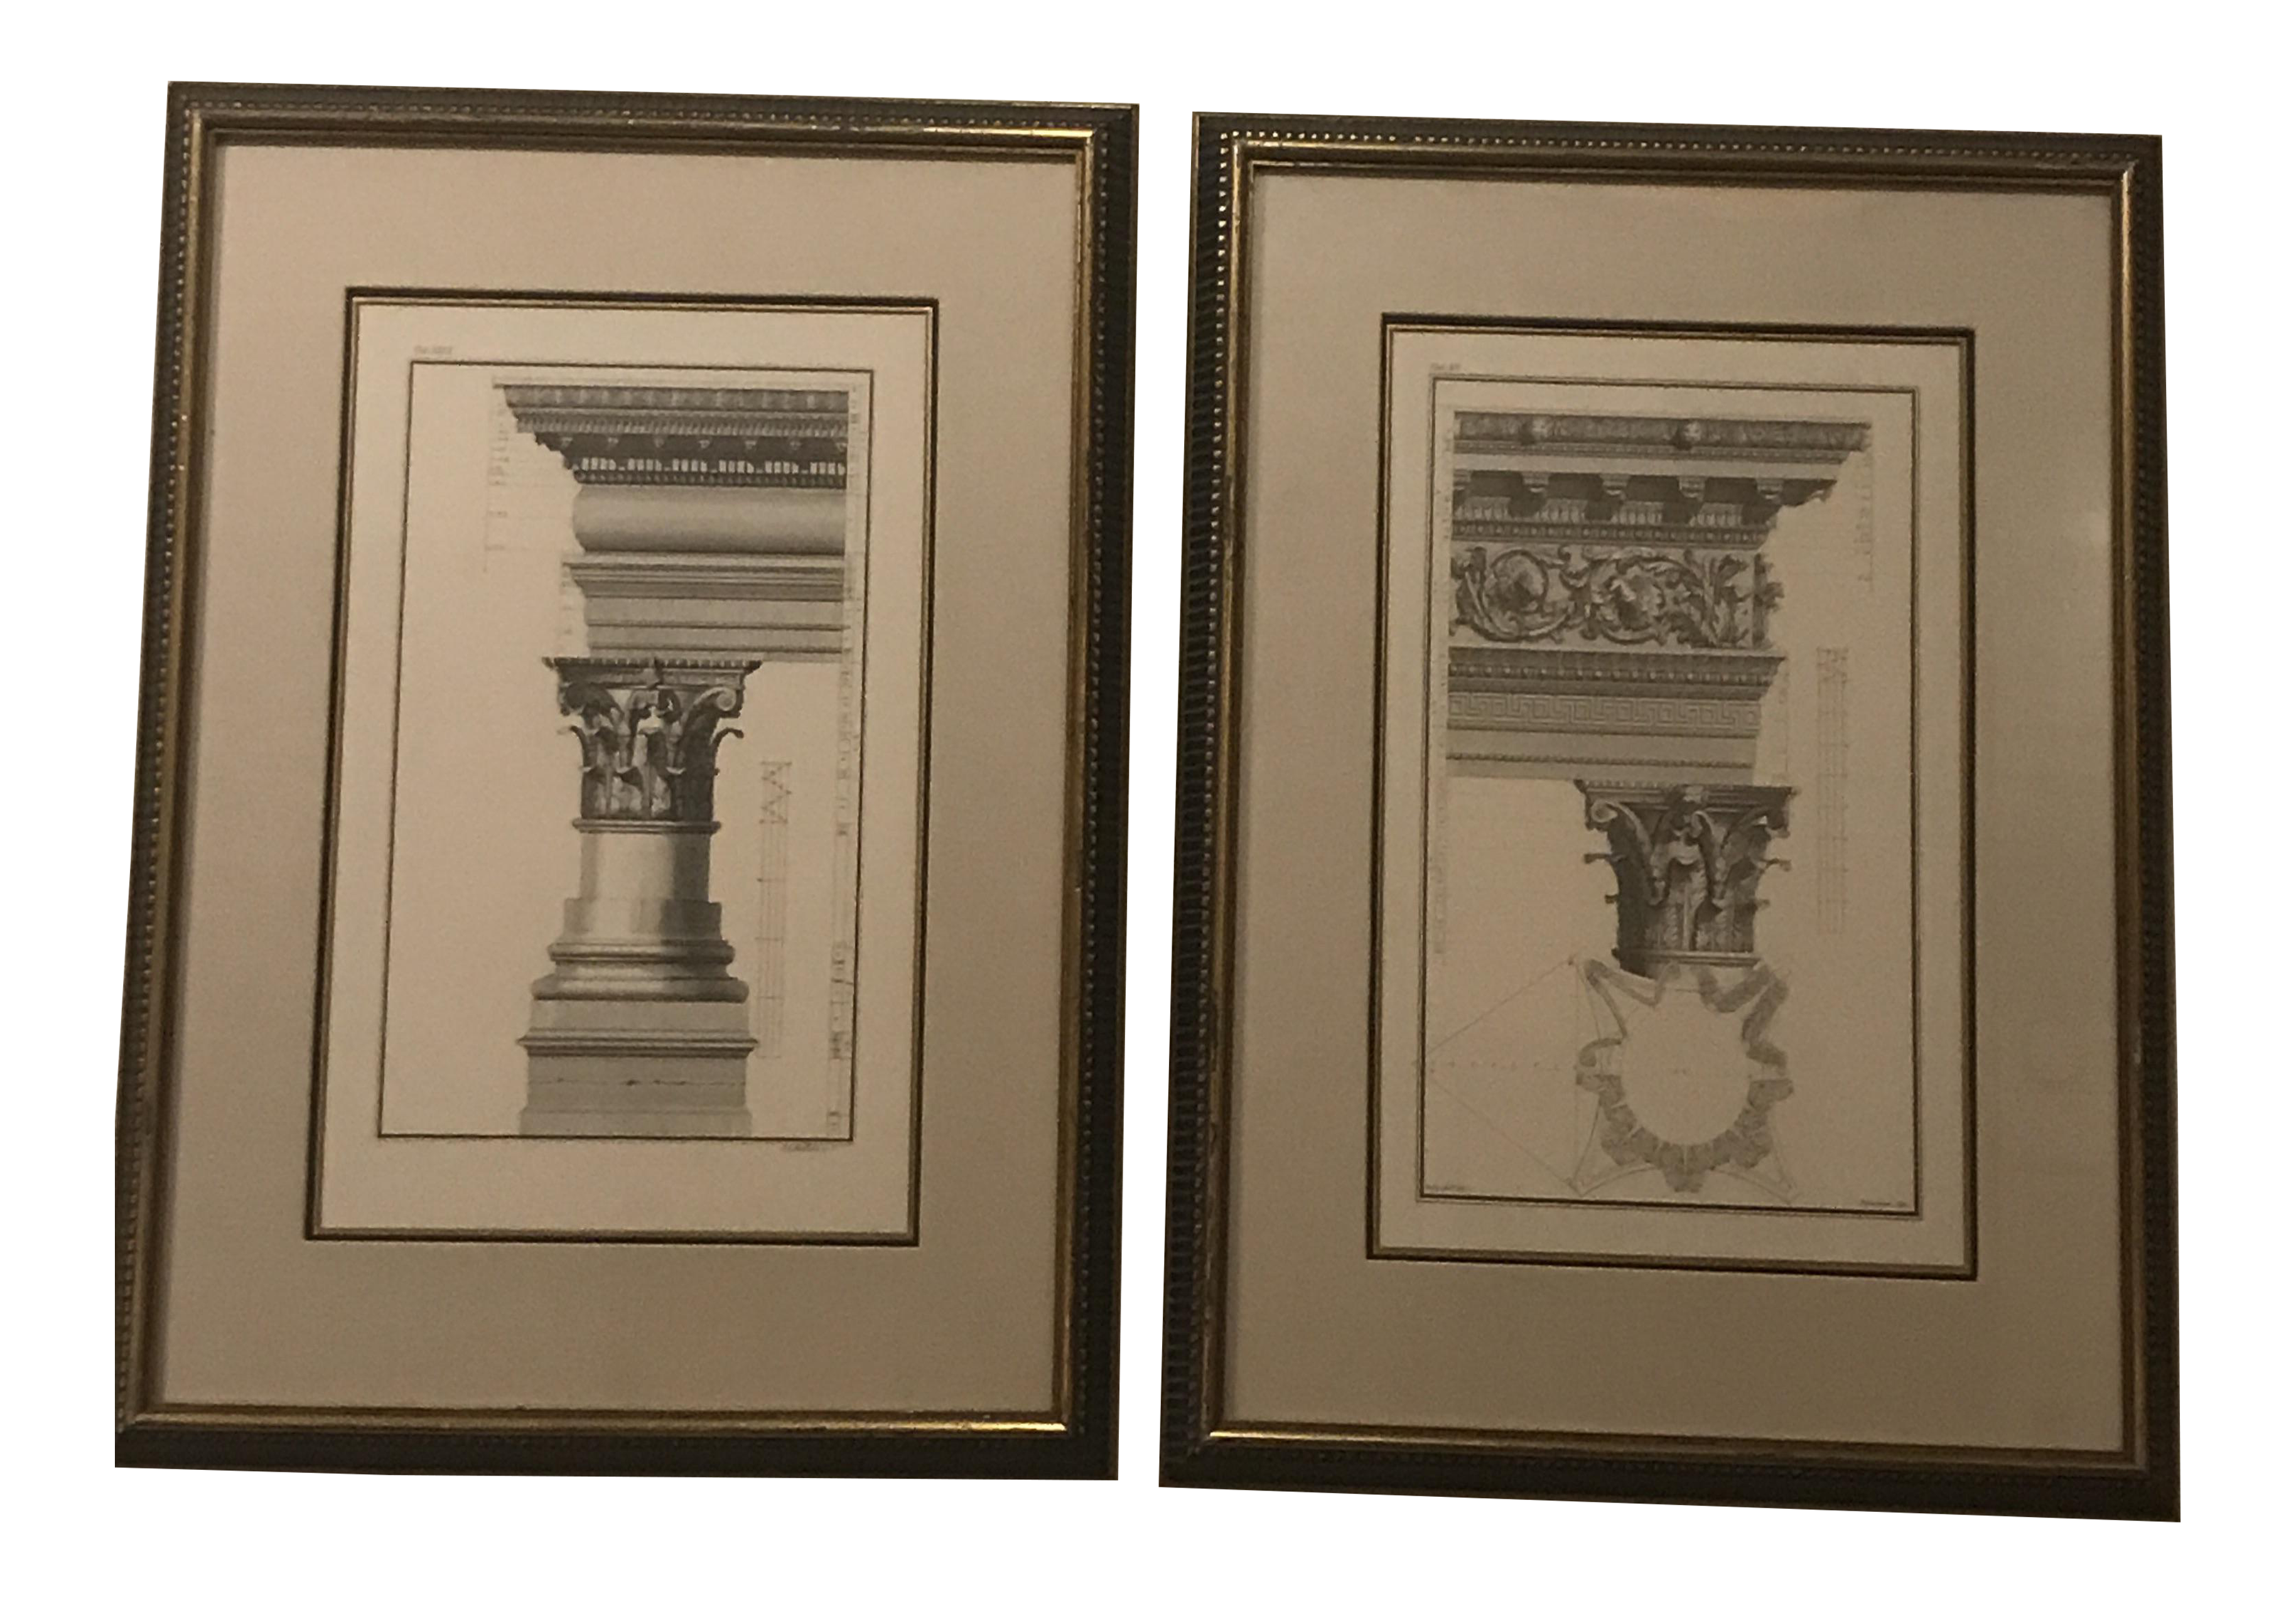 Framed & Matted Prints Styled for Perlmutter Freiwald